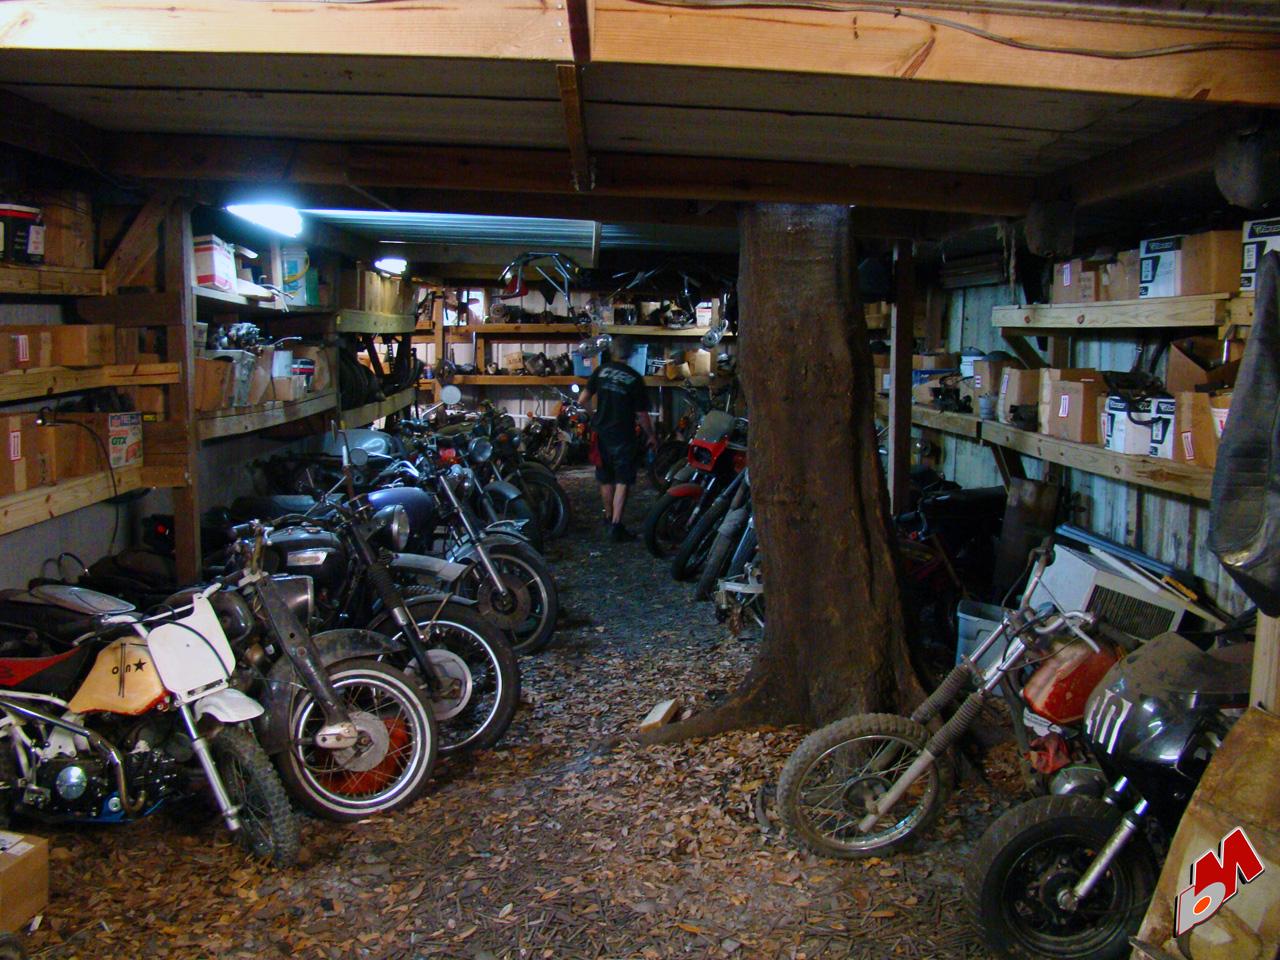 dd motorcycles motorcycle garage. Black Bedroom Furniture Sets. Home Design Ideas